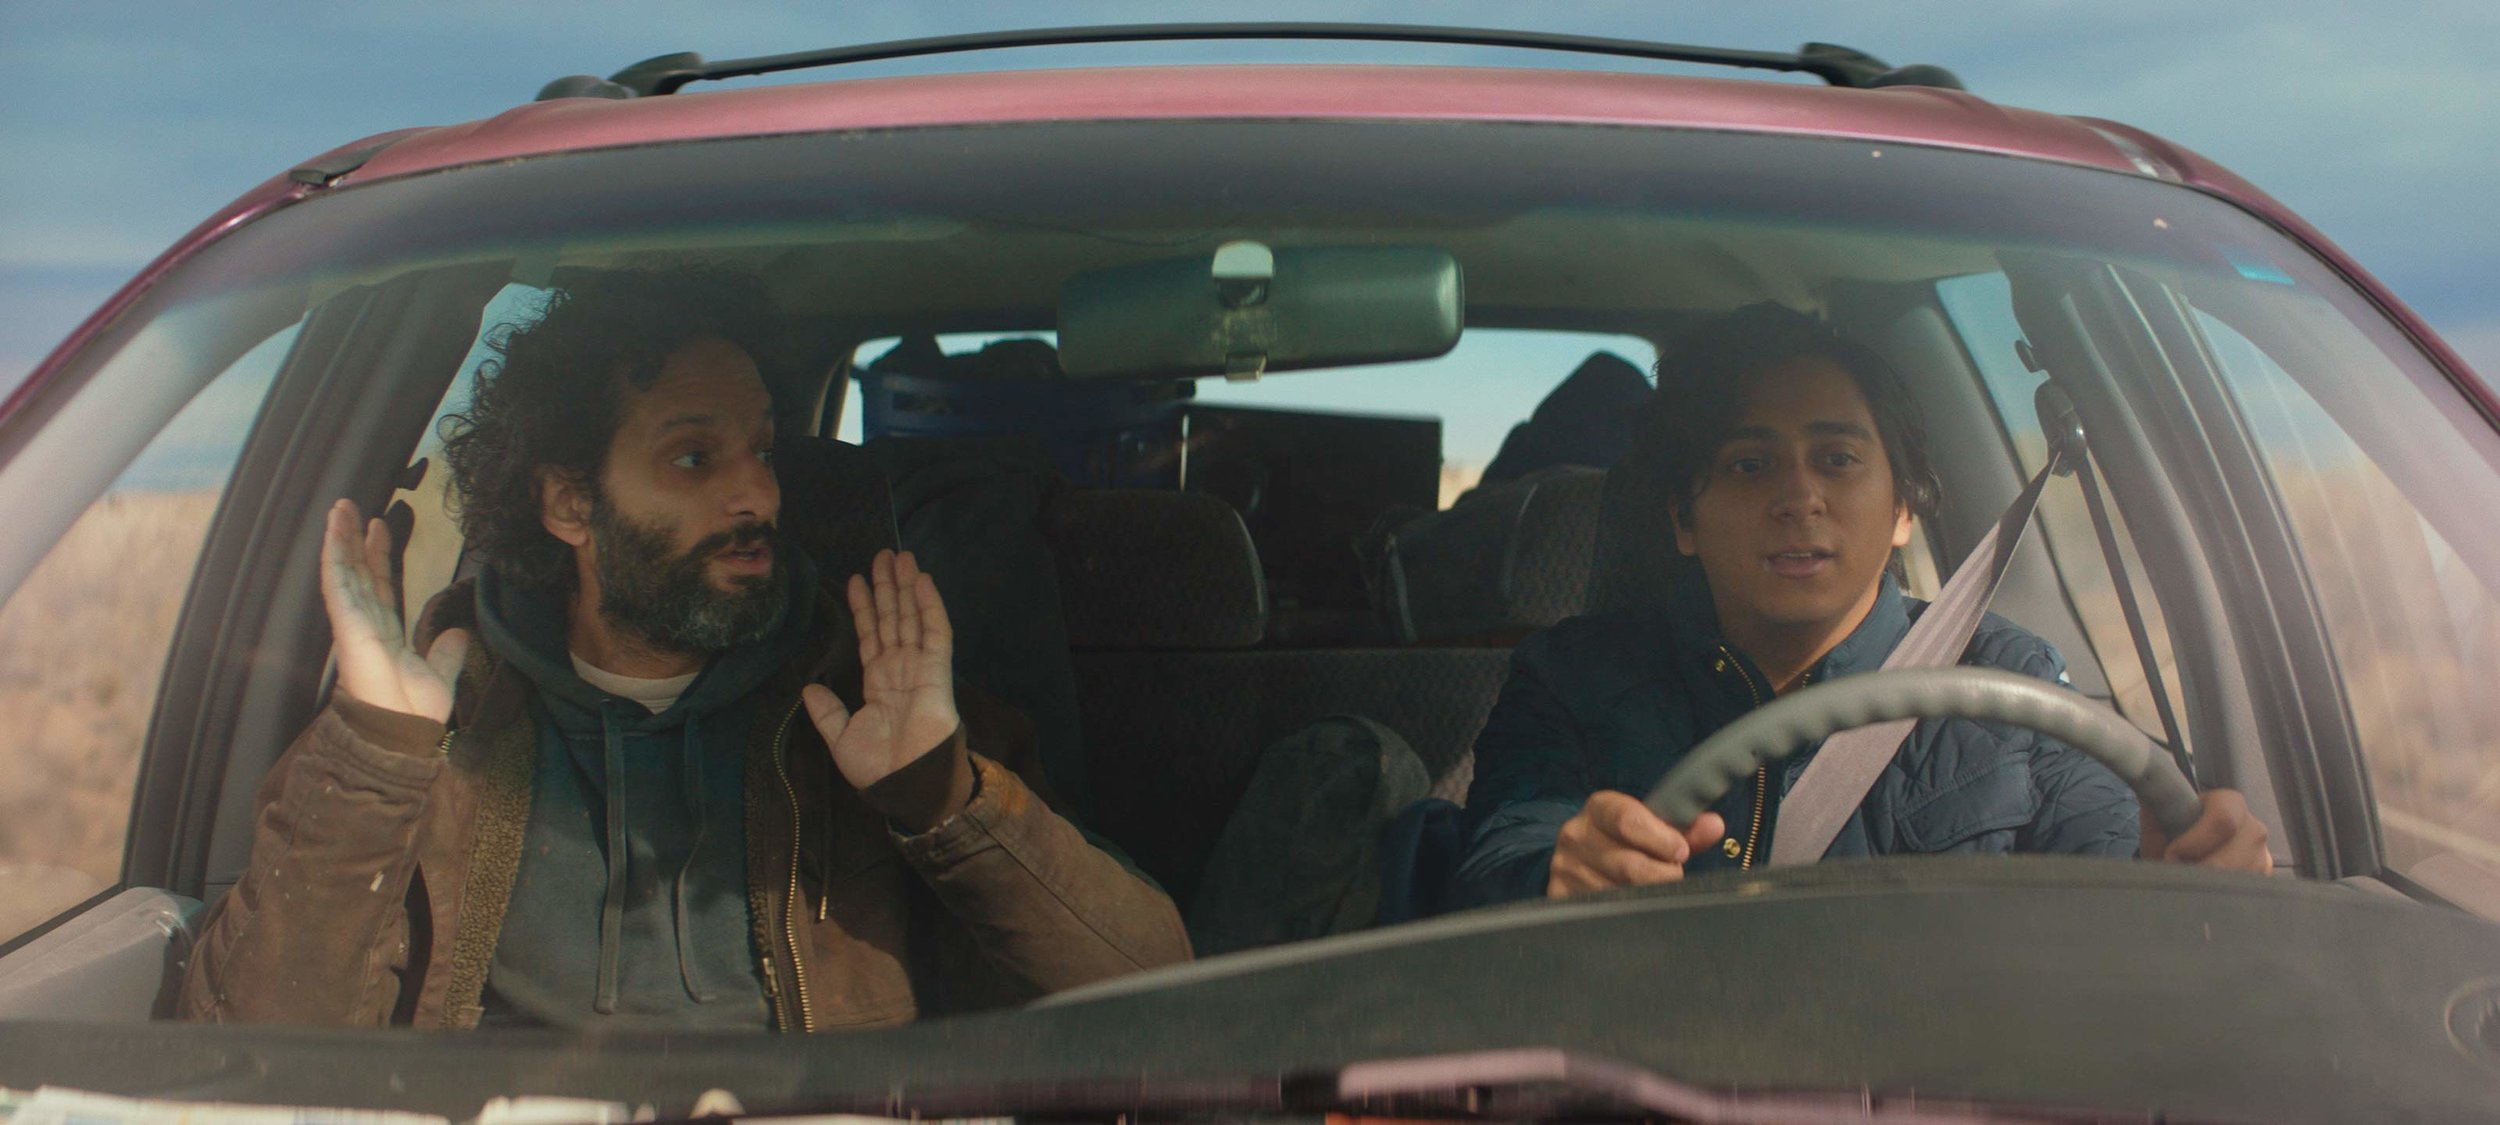 2018-seattle-international-film-festival-the-long-dumb-road.jpg